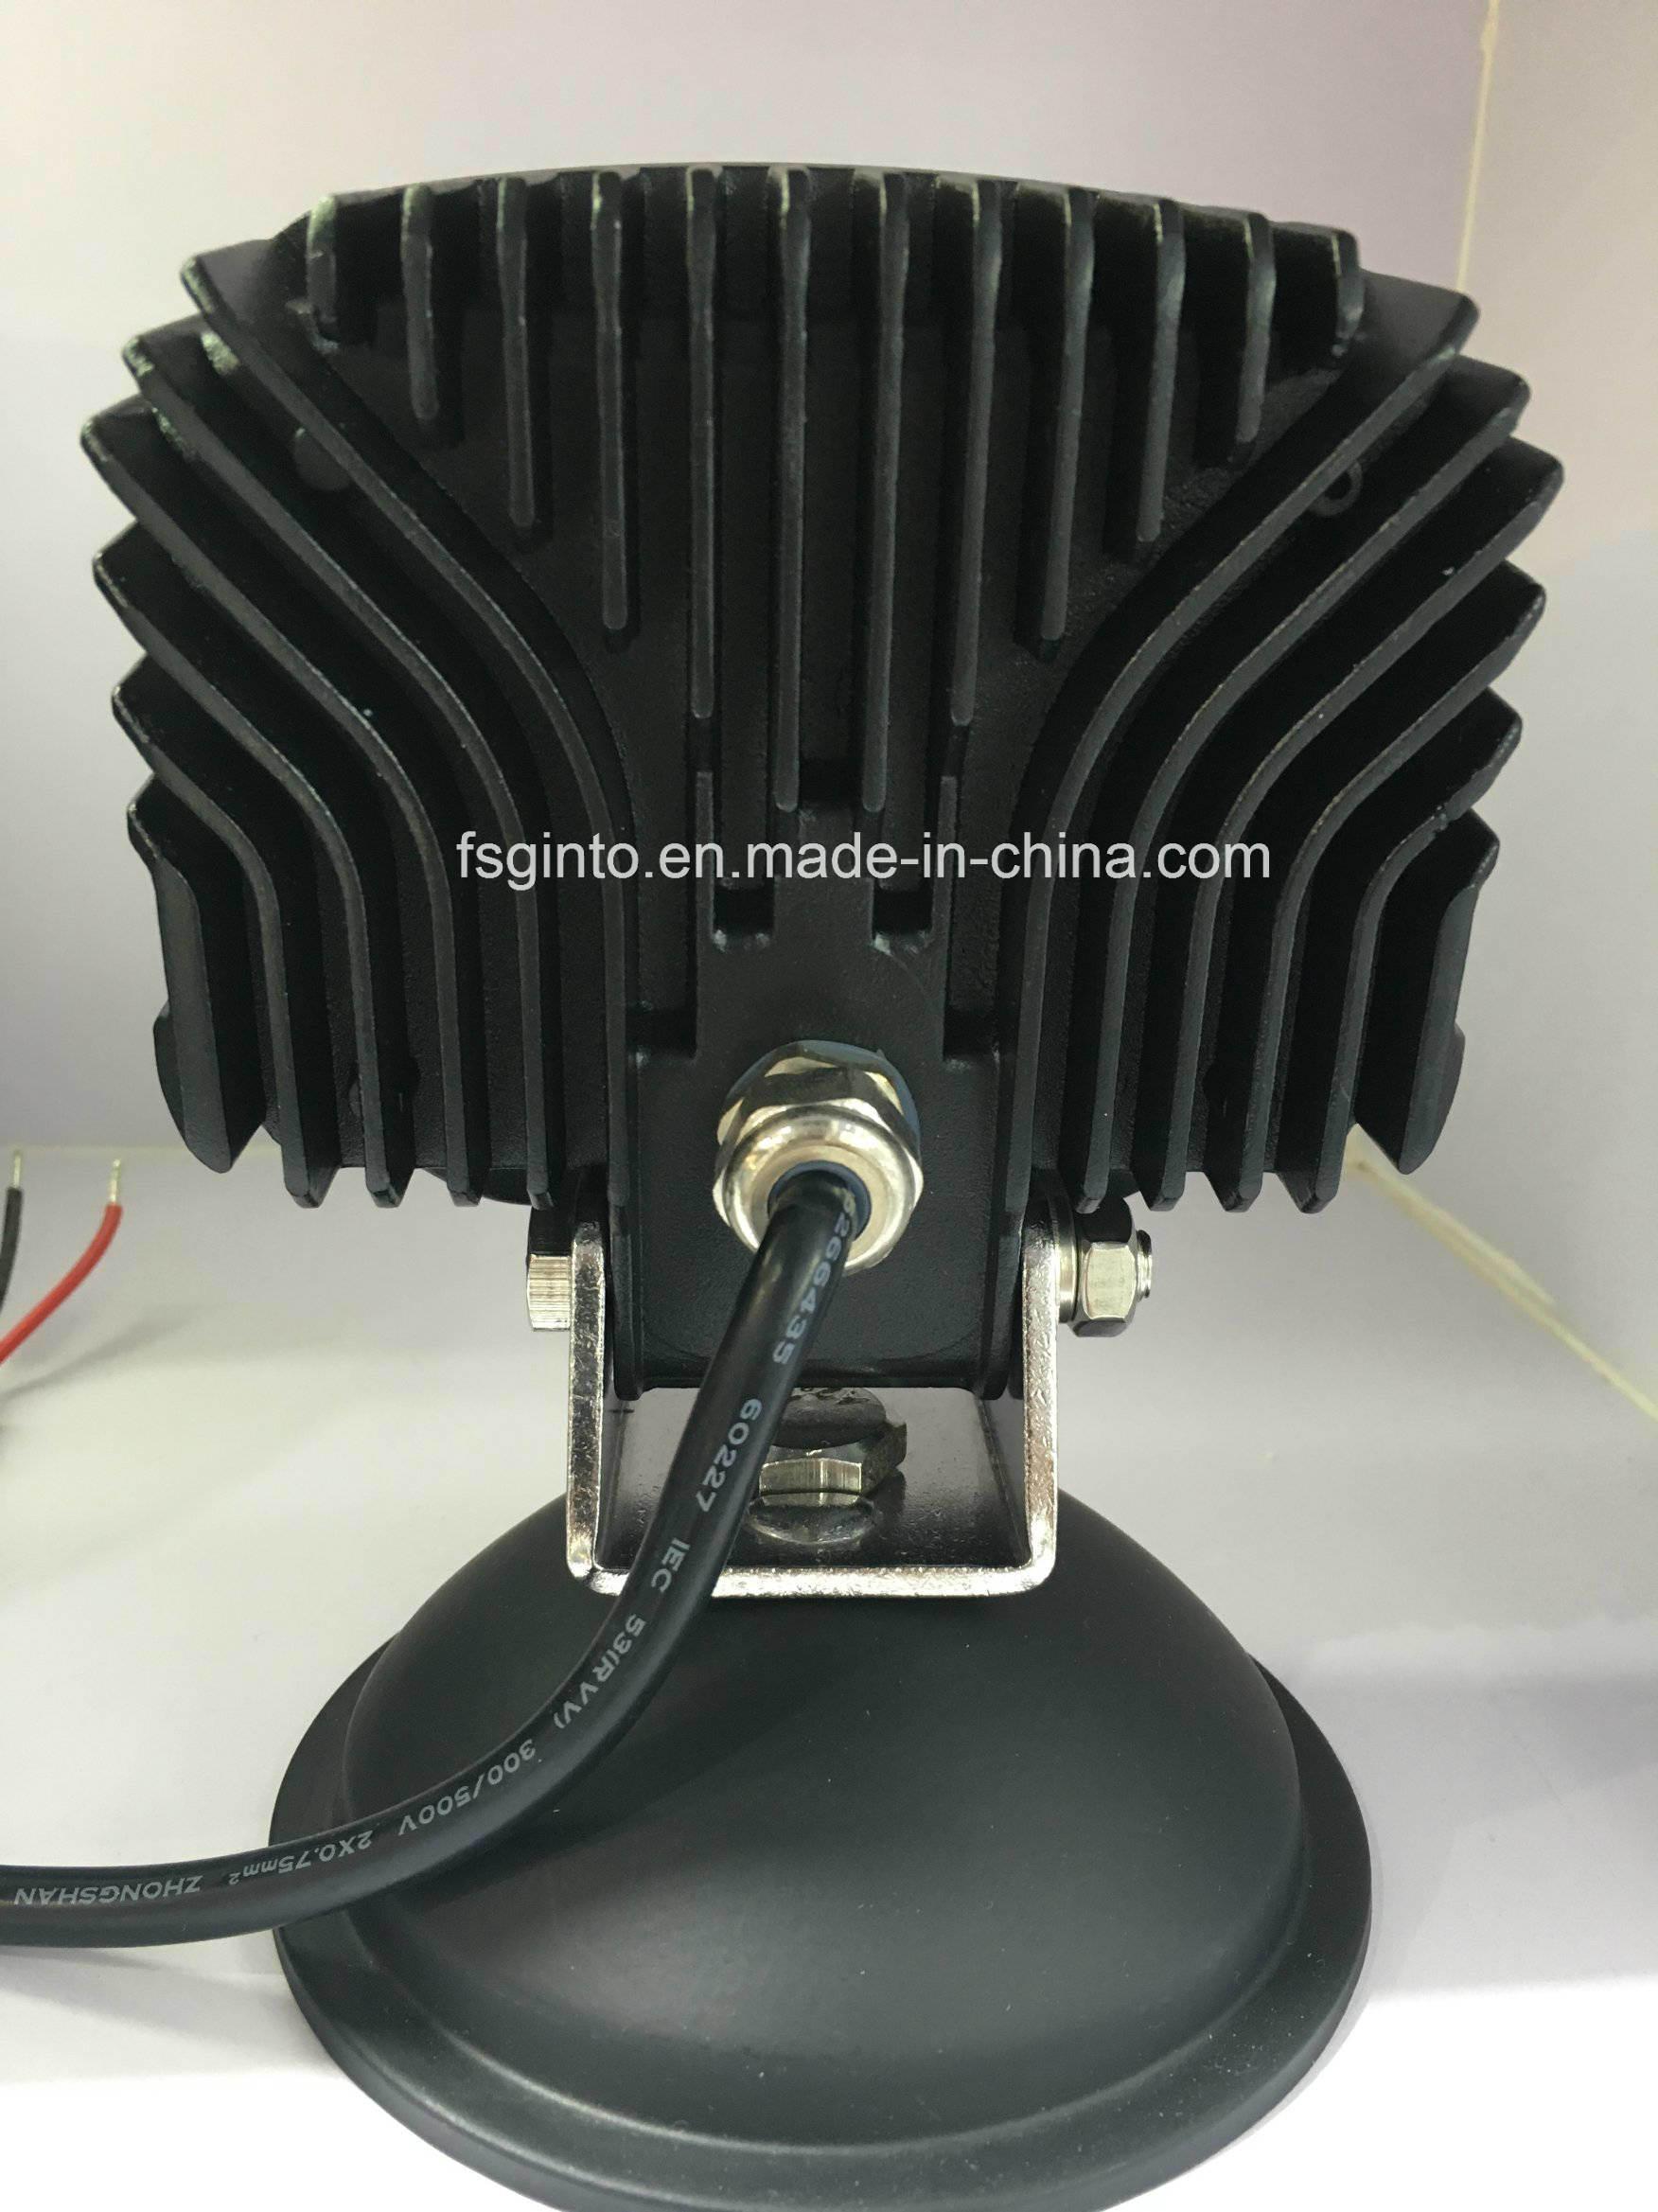 4.4inch 30W Osram LED Flood Working Light (GT2012-30W)